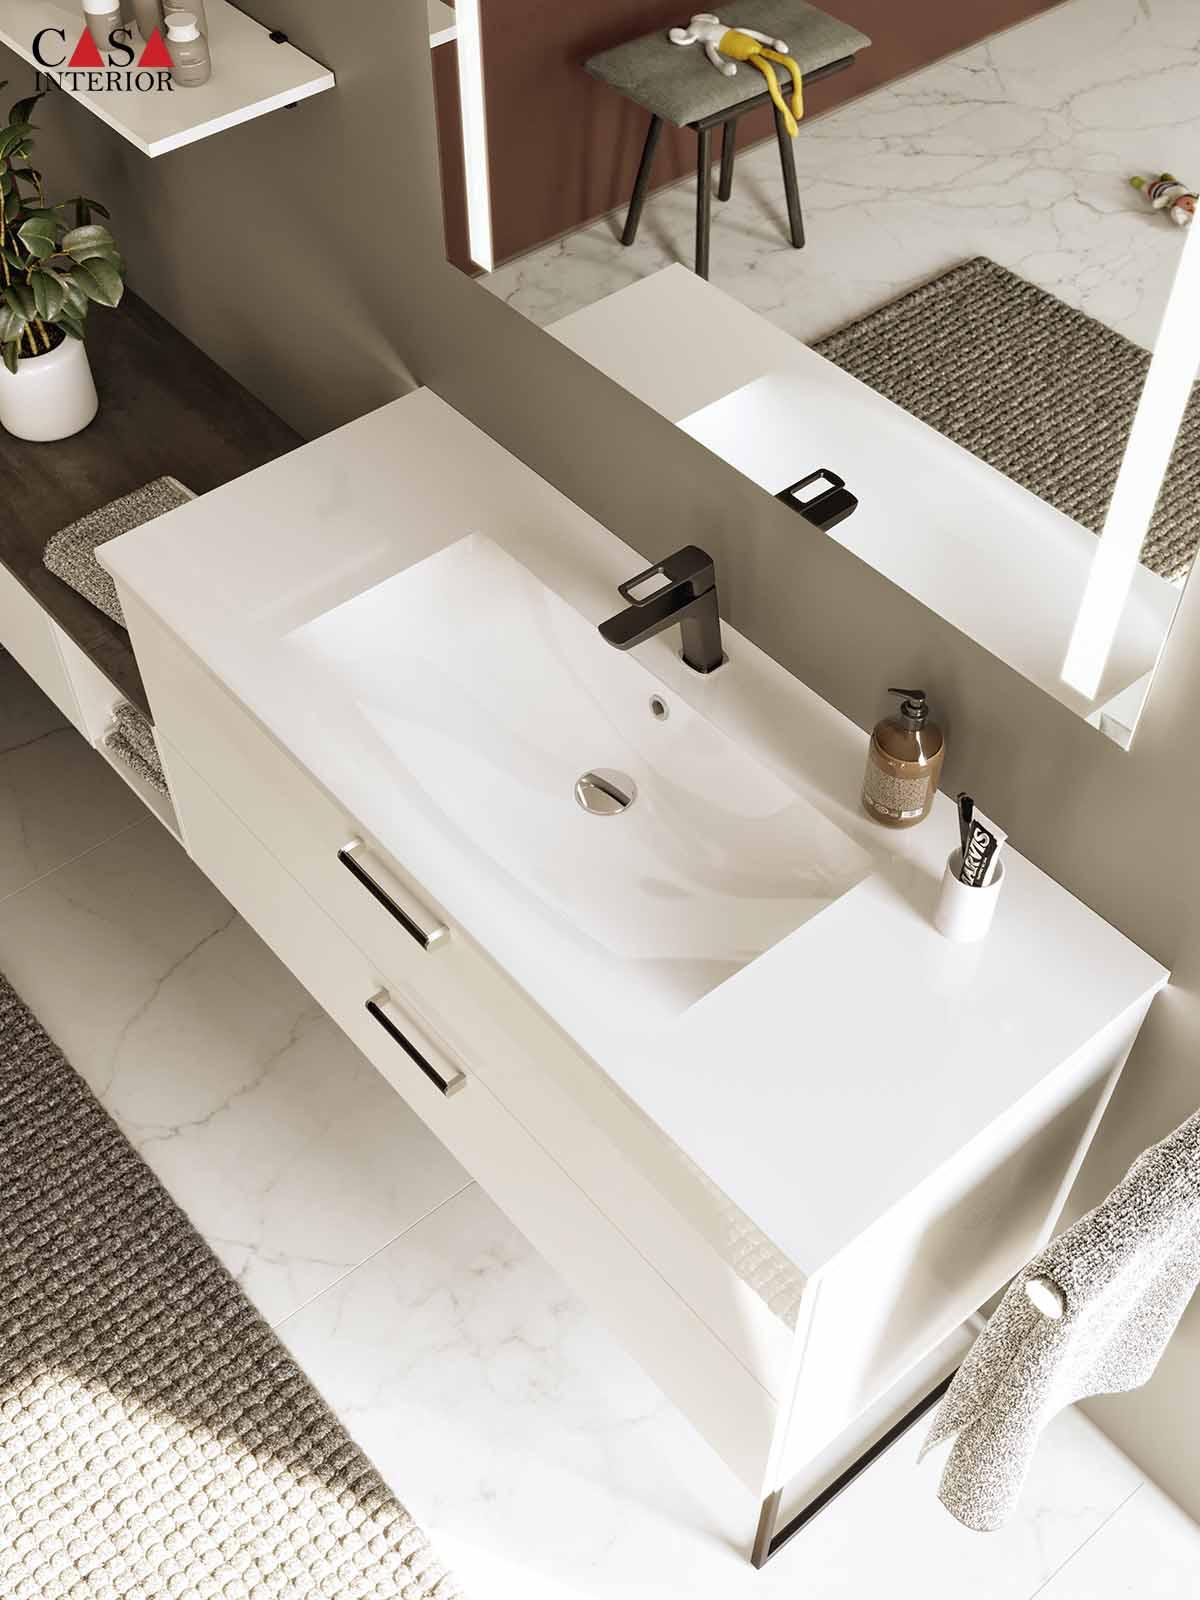 Küchentime Flash Lacquered laminate, alpine white high gloss 503 - Bathroom